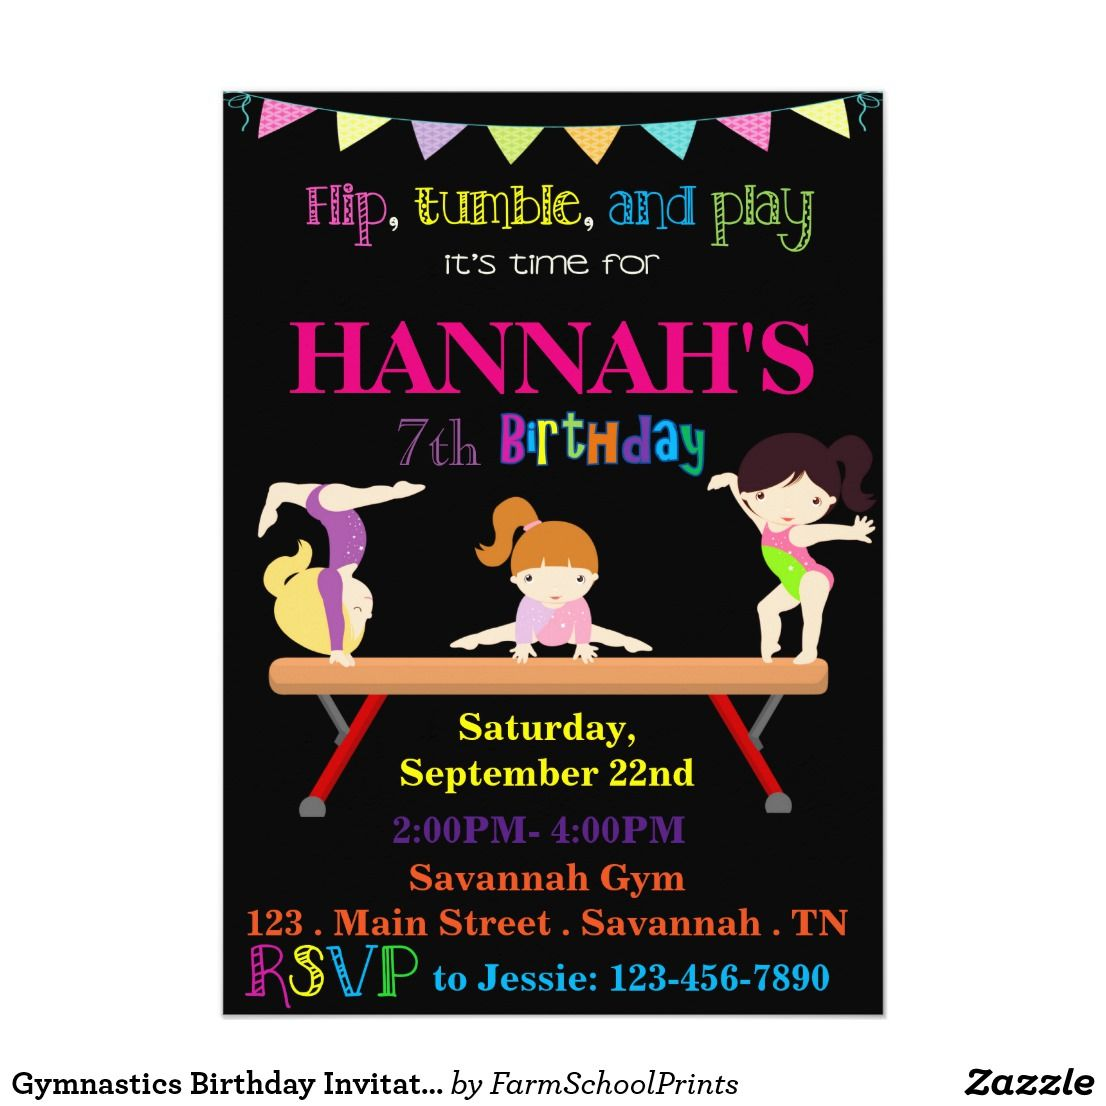 Gymnastics birthday invitation gymnastics birthday invitation invite your guests to flip tumble and play in honor of stopboris Gallery